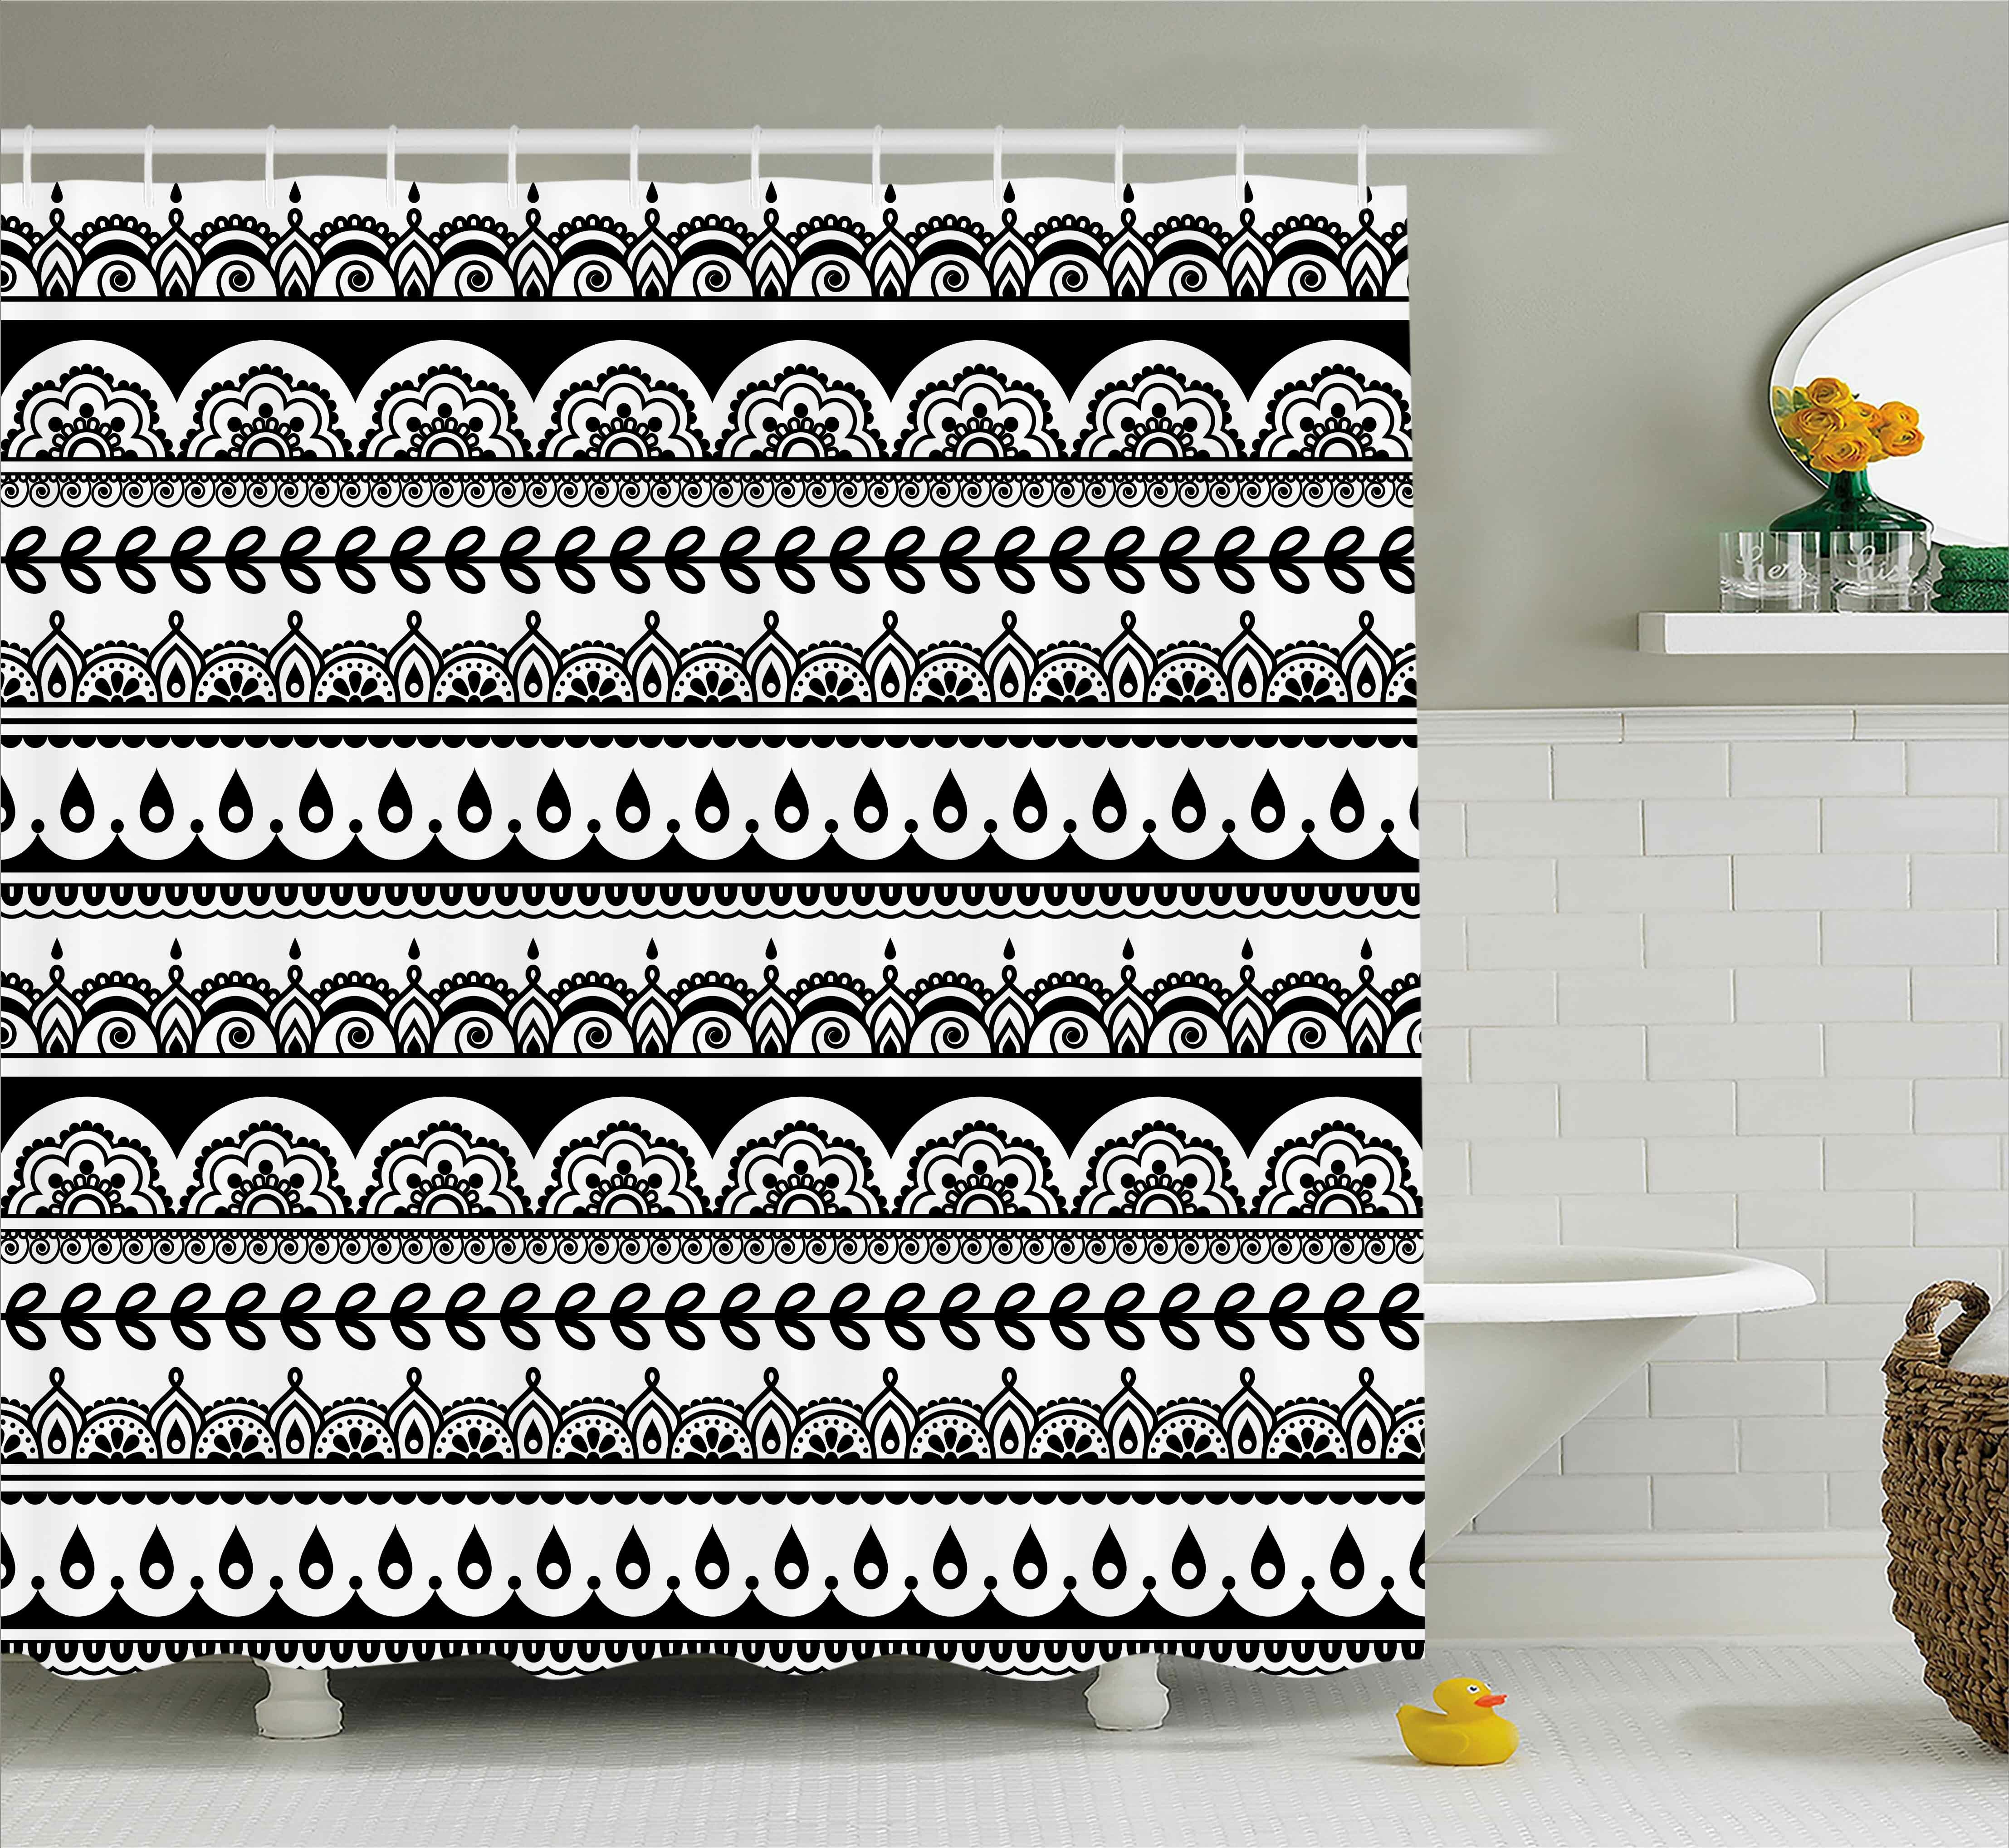 Ebern Designs Darla Tribal Ethnic Borders With Leaves Flowers Ivy Swirls Indian Inspired Art Image Single Shower Curtain Wayfair